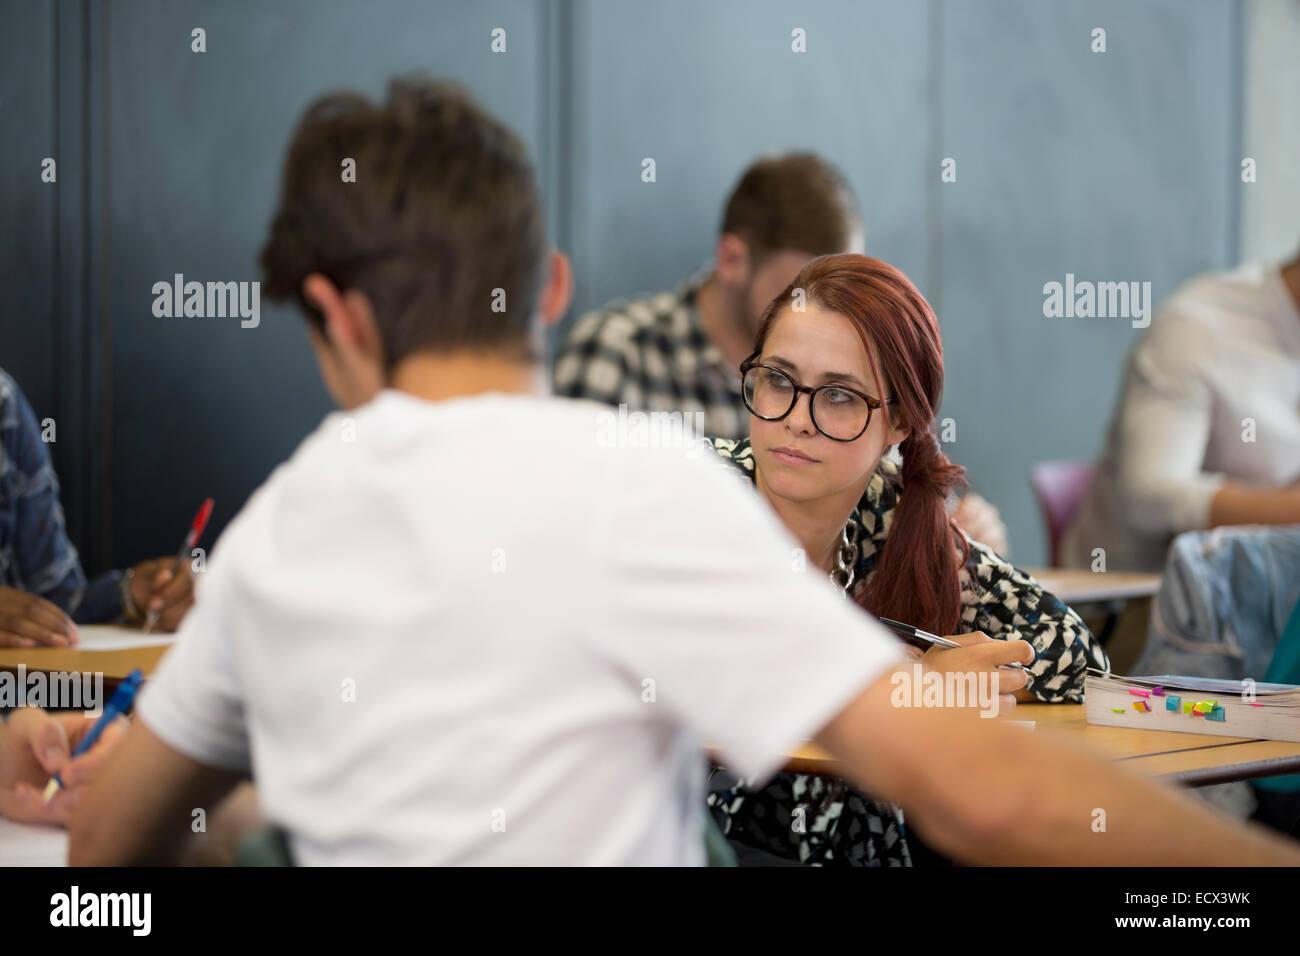 University students taking notes during seminar - Stock Image